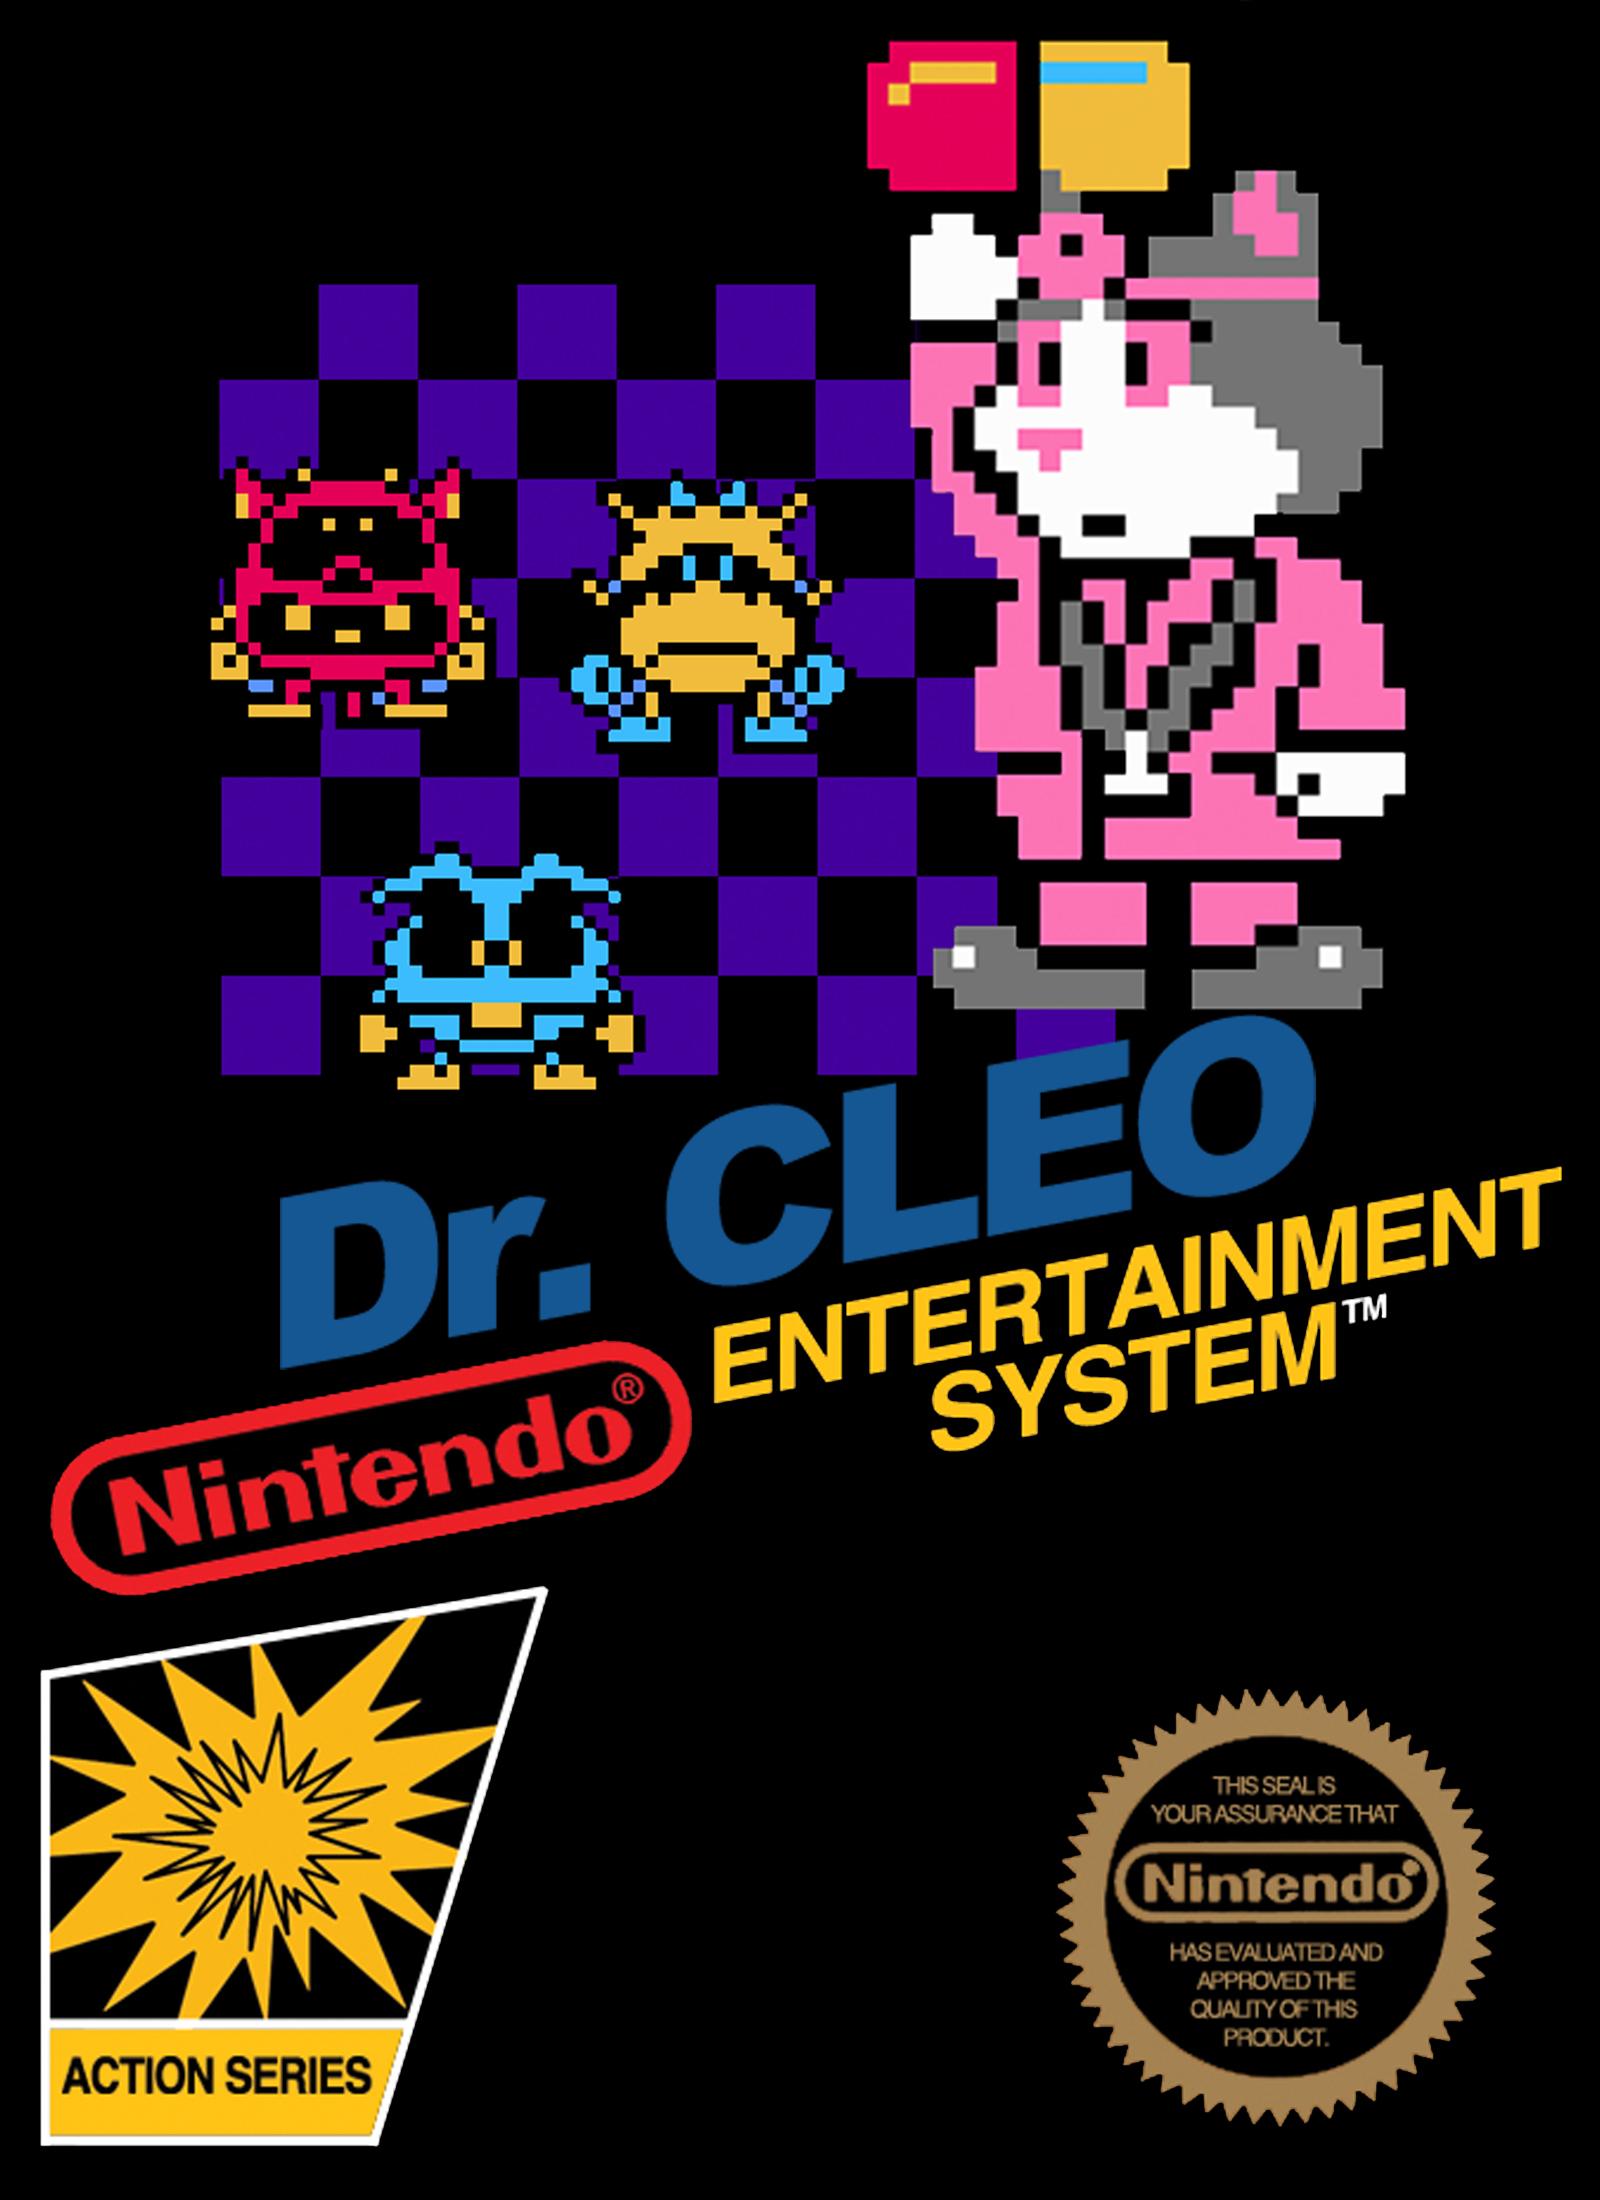 Dr Cleo